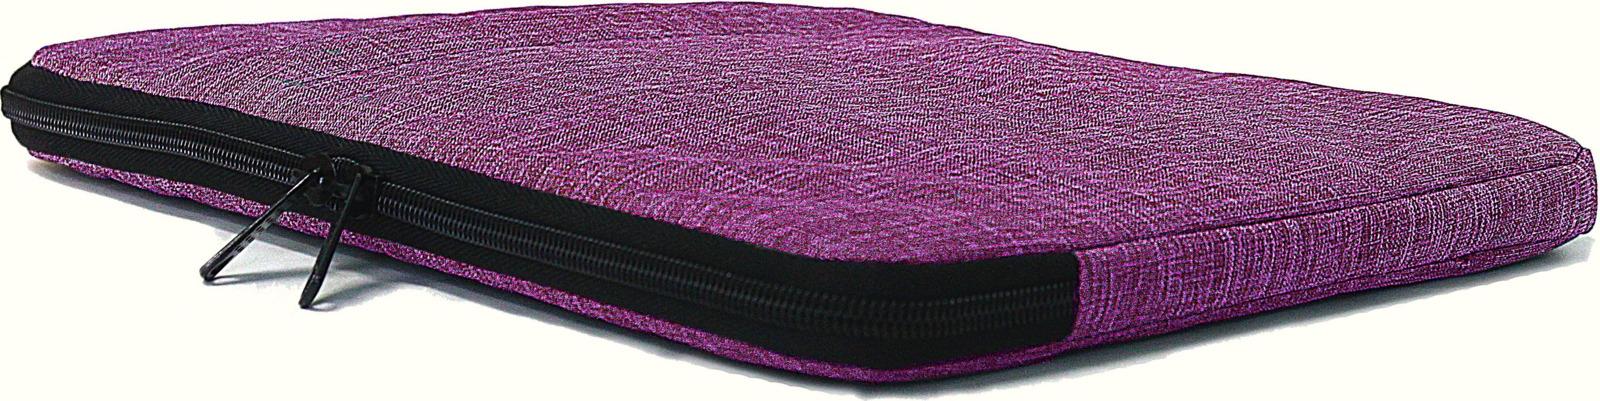 Чехол для ноутбука Vivacase VCNCOV13pink к MacBook 1213 3 розовый